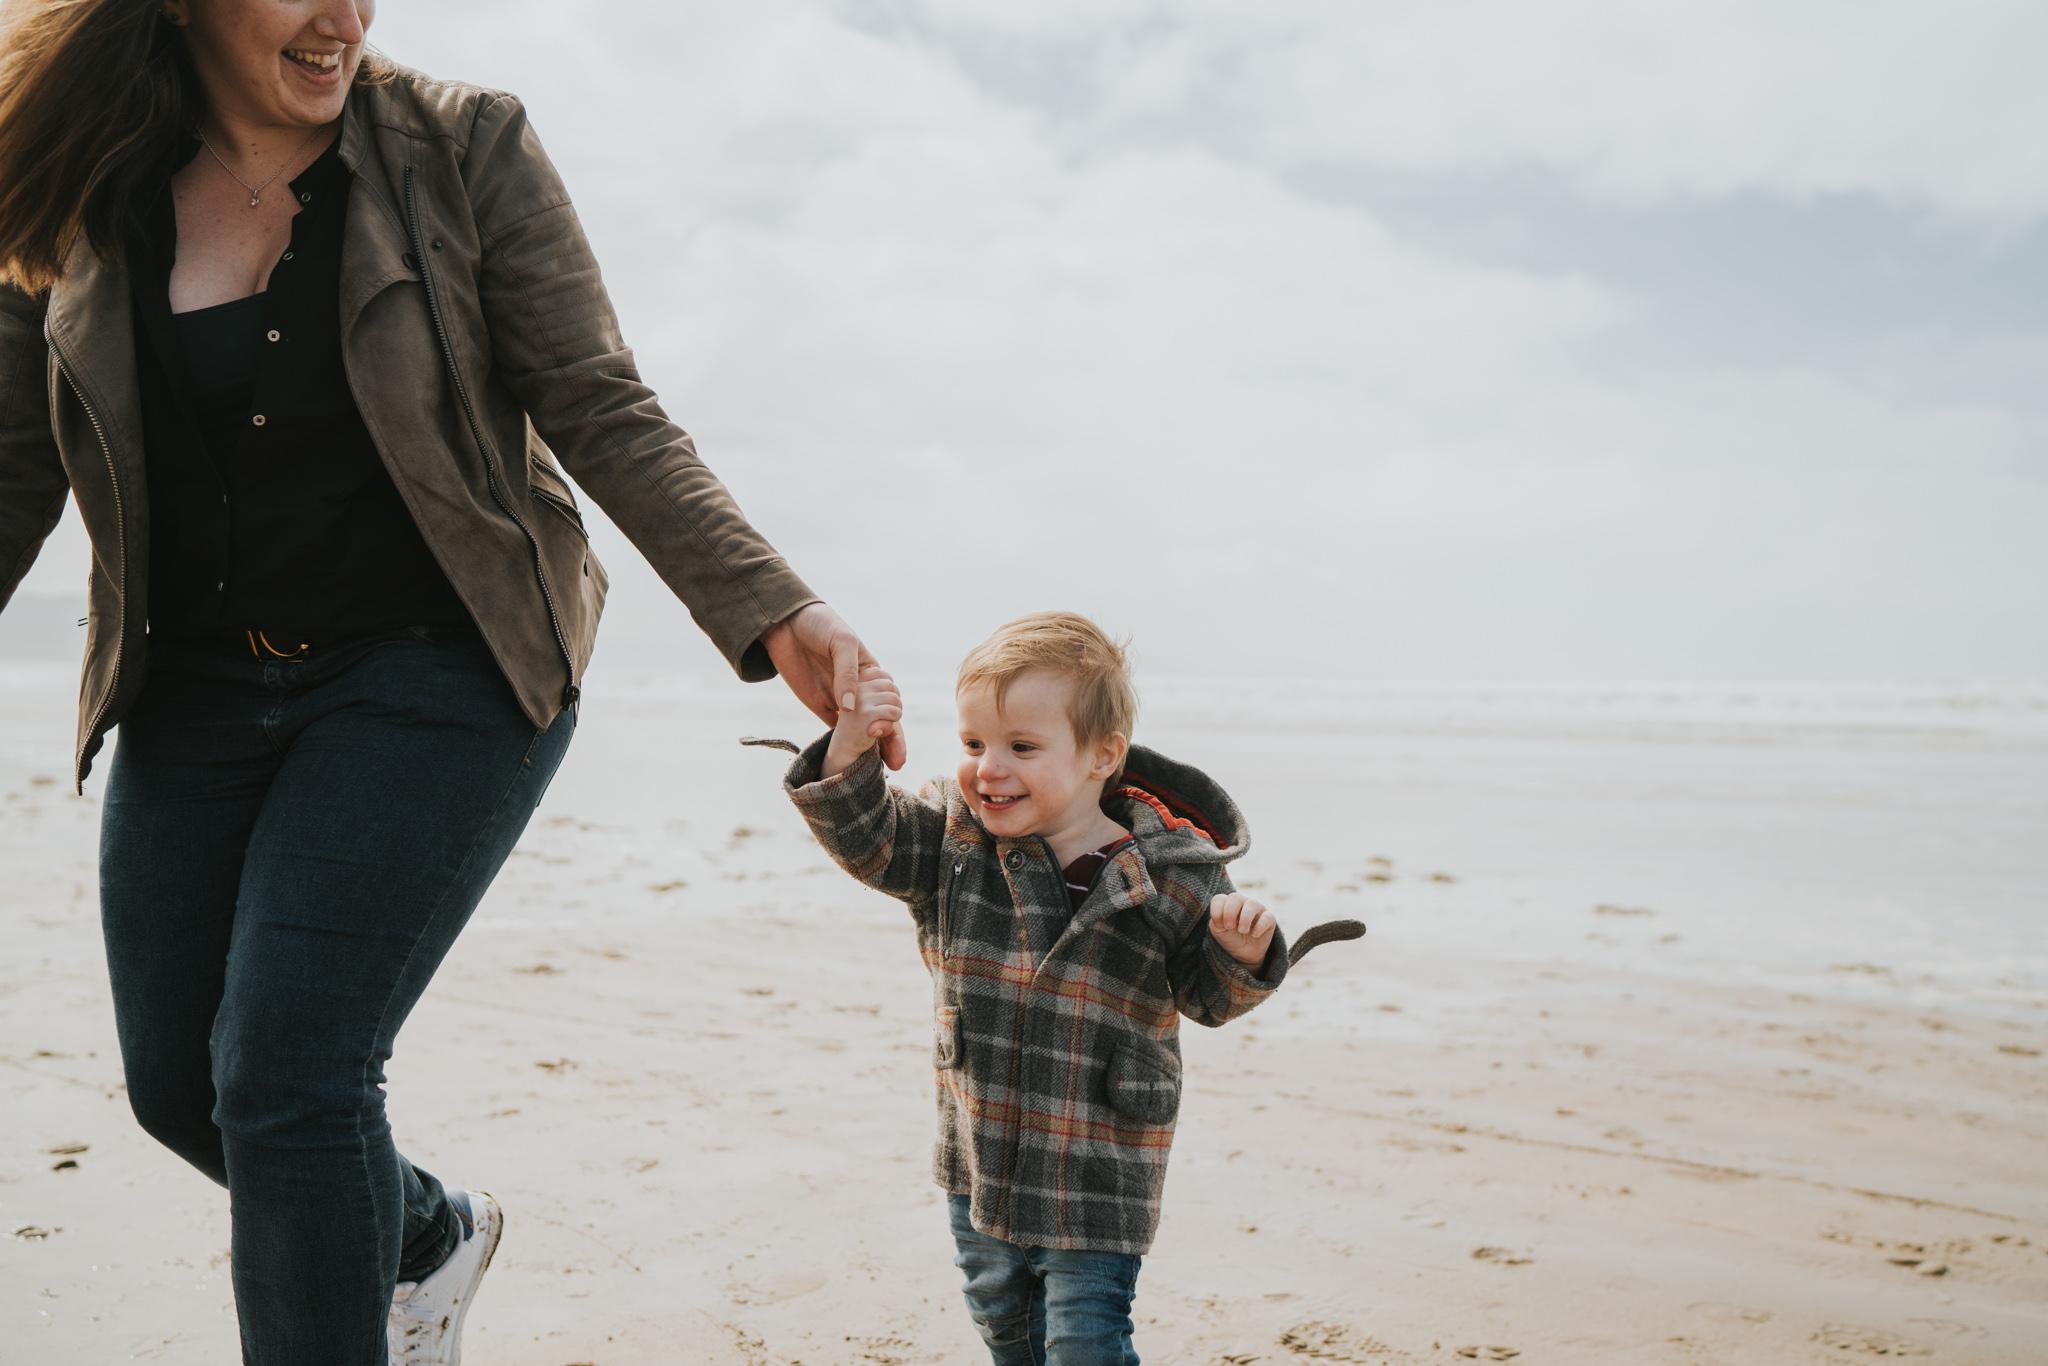 beach-family-session-westward-ho-north-devon-grace-elizabeth-devon-family-wedding-photographer-essex-devon-norfolk (17 of 43).jpg